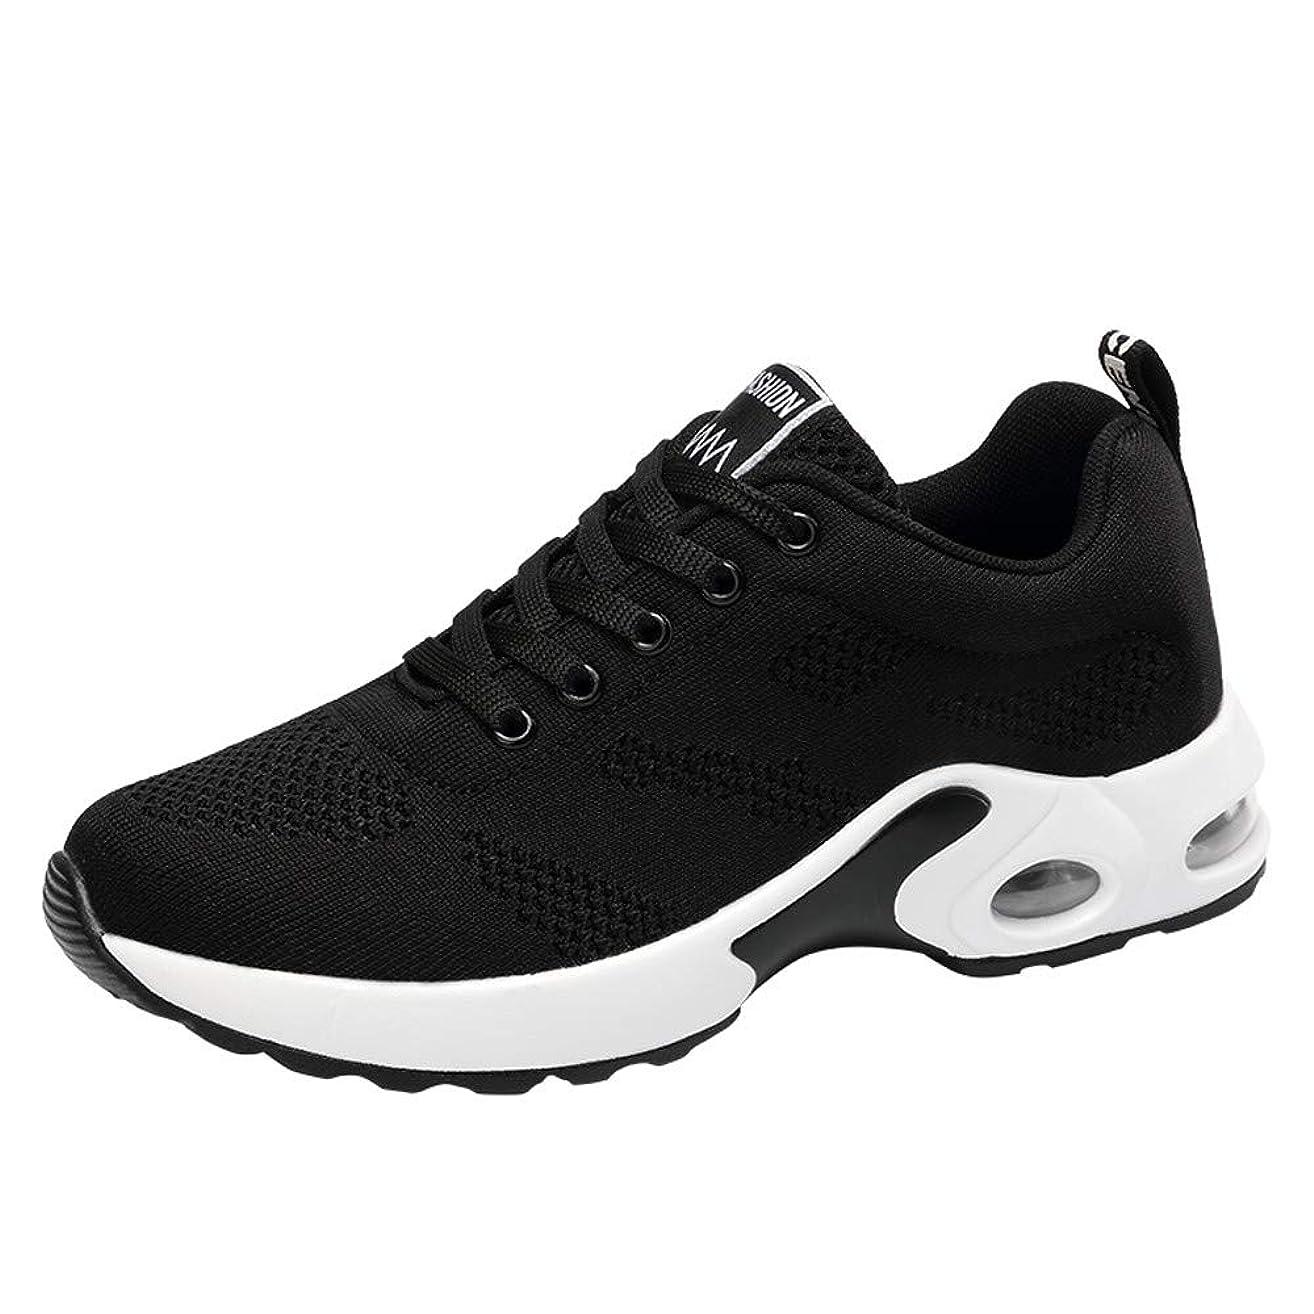 Kauneus ???? Women's Casual Walking Shoes Breathable Mesh Work Slip-on Sneakers